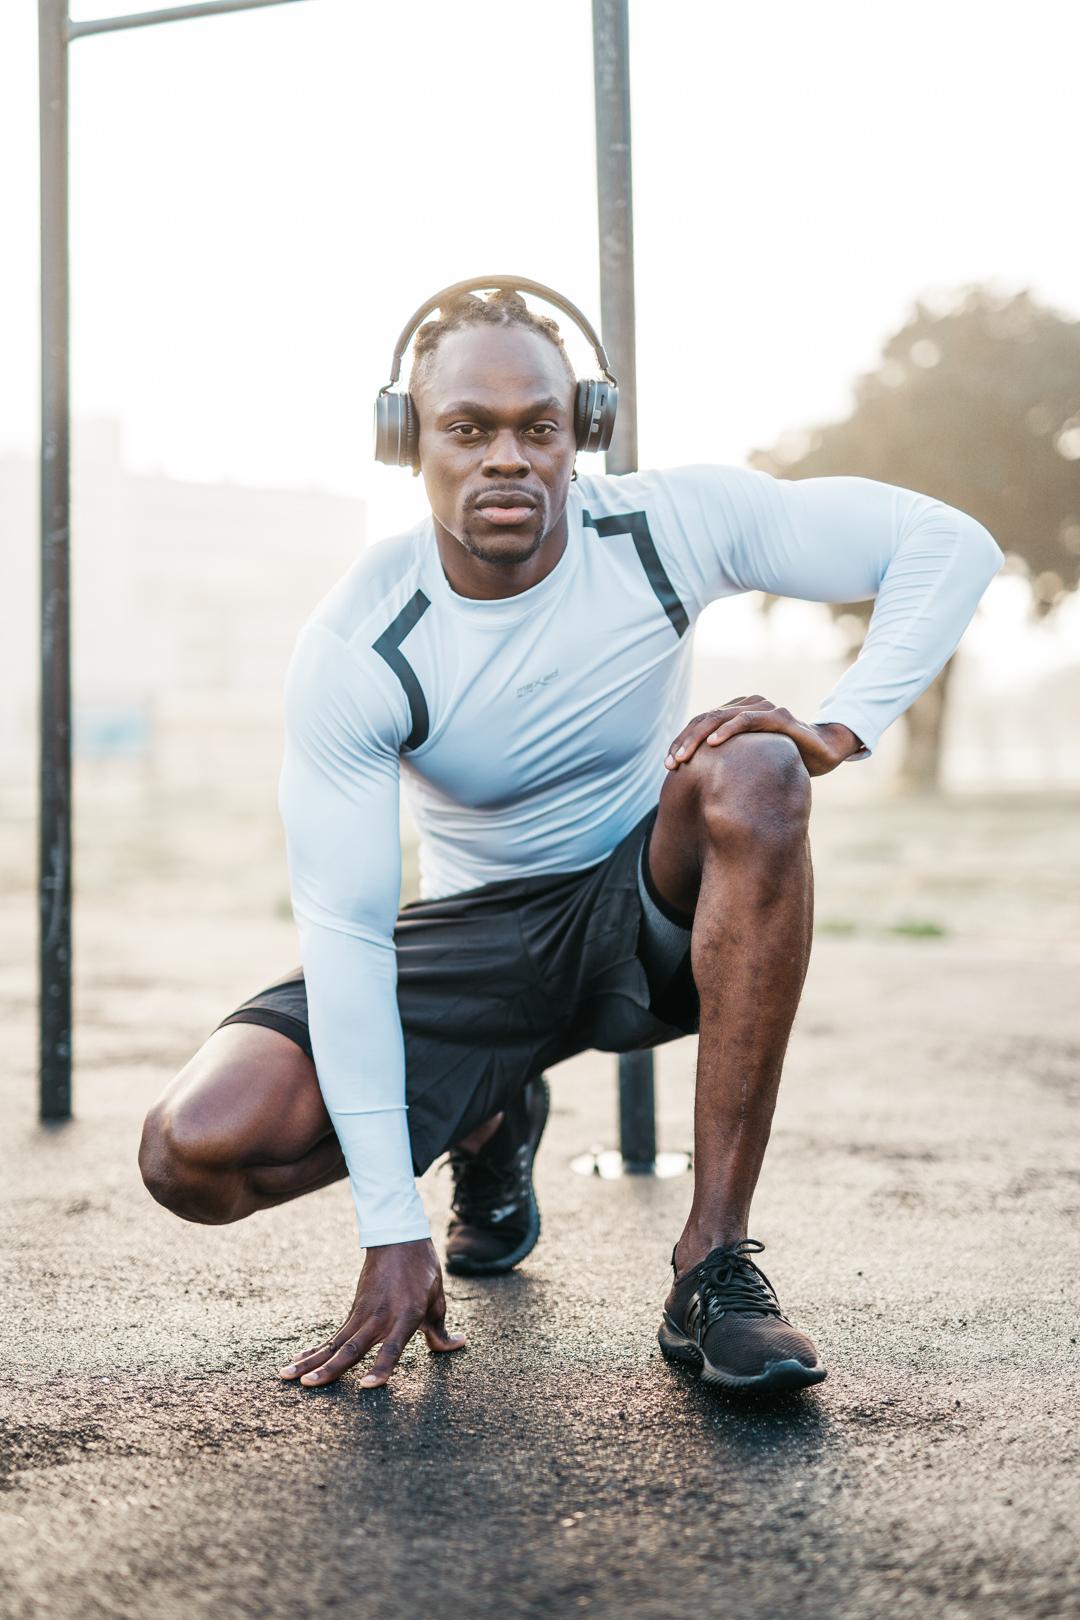 Fitness Portrait Photography Jose Bin - Cape Town Model - by Cape Image Co-13.jpg